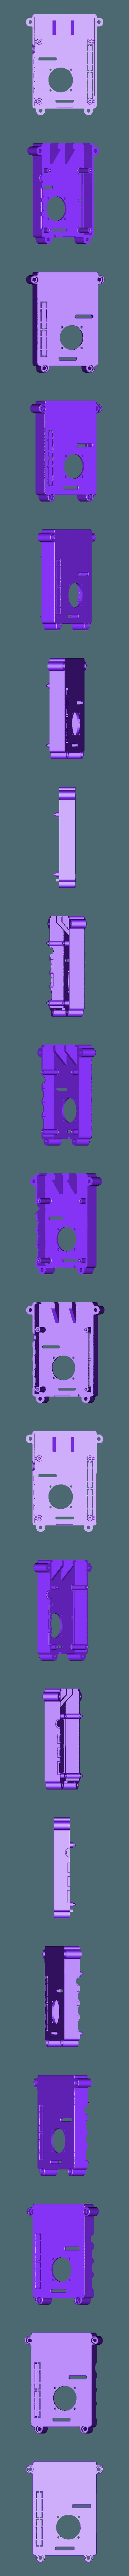 FULL_25MM_SLOTTED_BLANK.STL Télécharger fichier STL gratuit Étui Pi 4B Framboise Framboise • Objet pour imprimante 3D, mkellsy